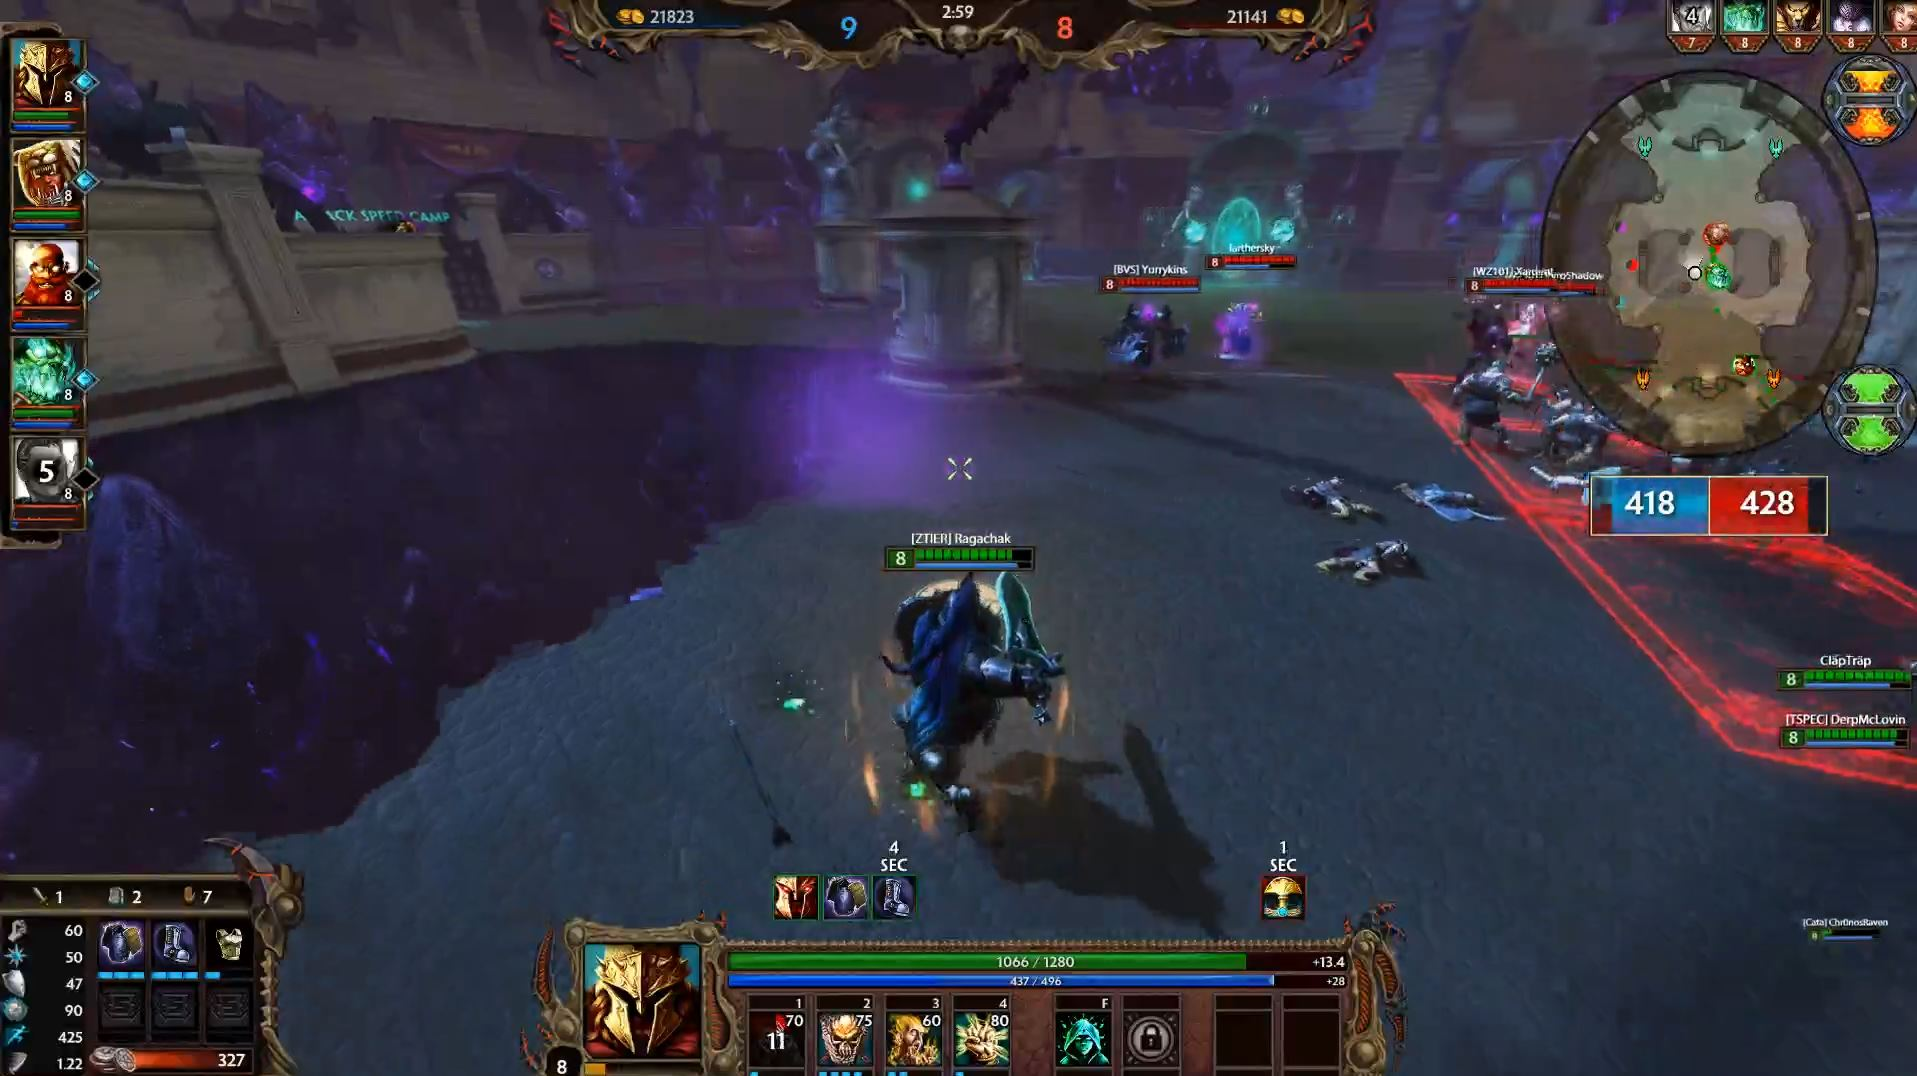 SMITE: Corrupted Arena Impressions